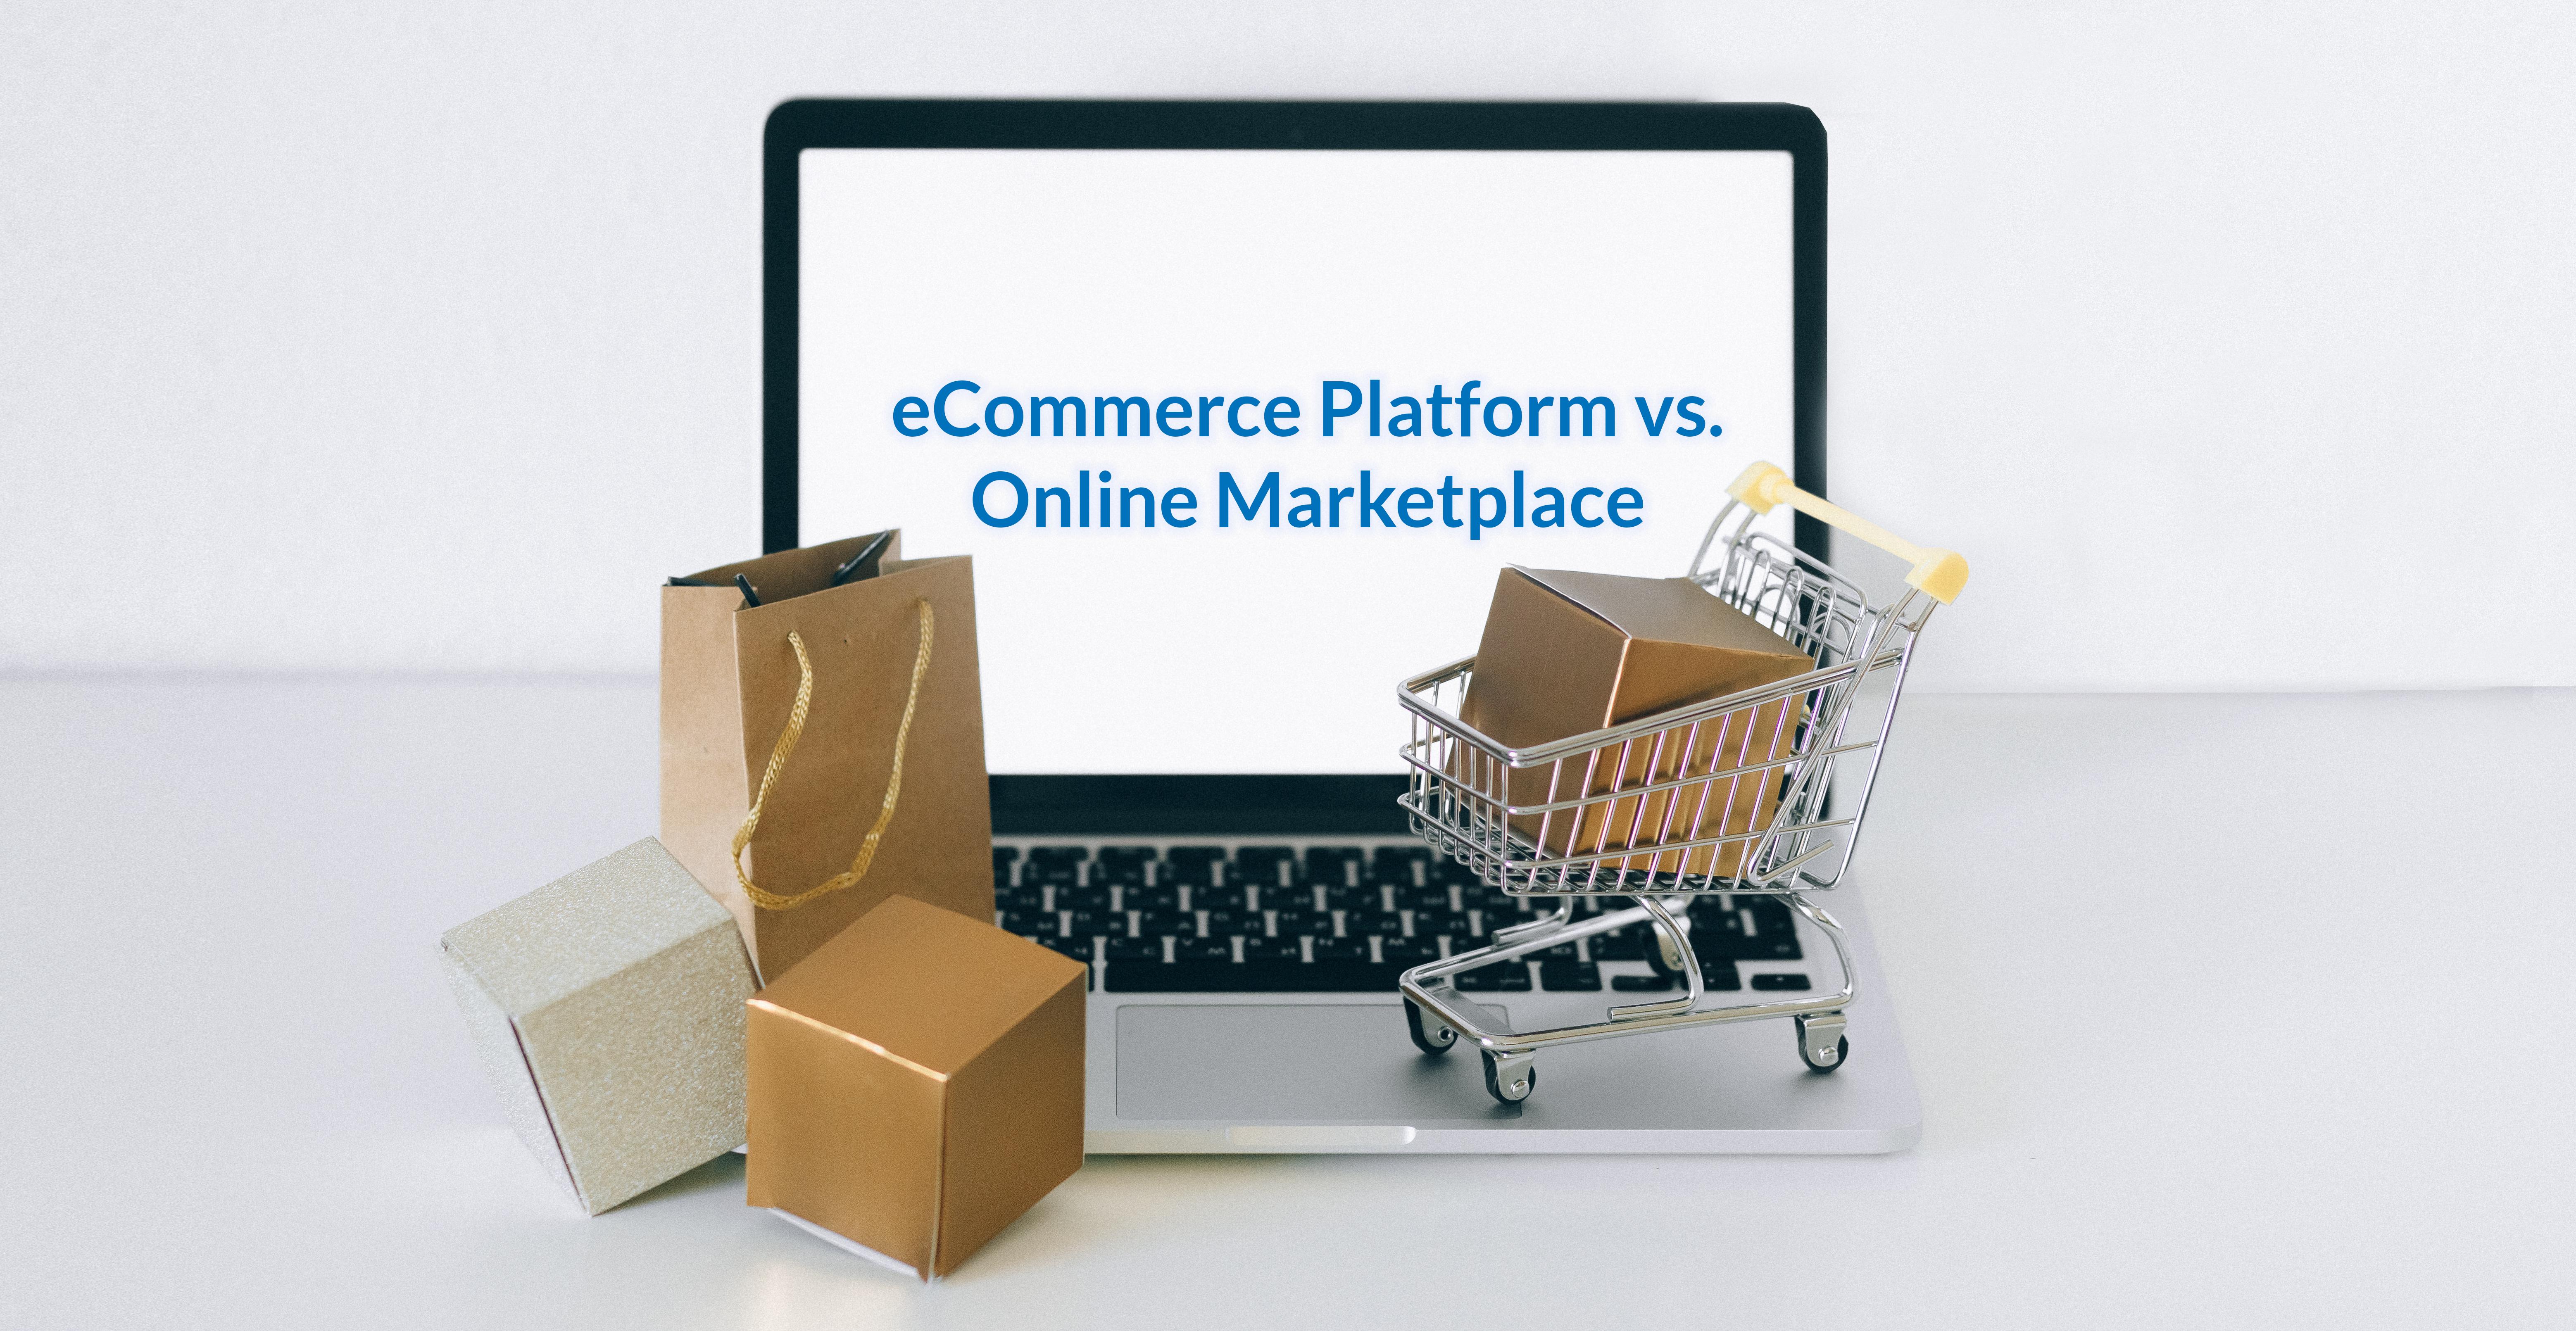 eCommerce Platform vs. Online Marketplace